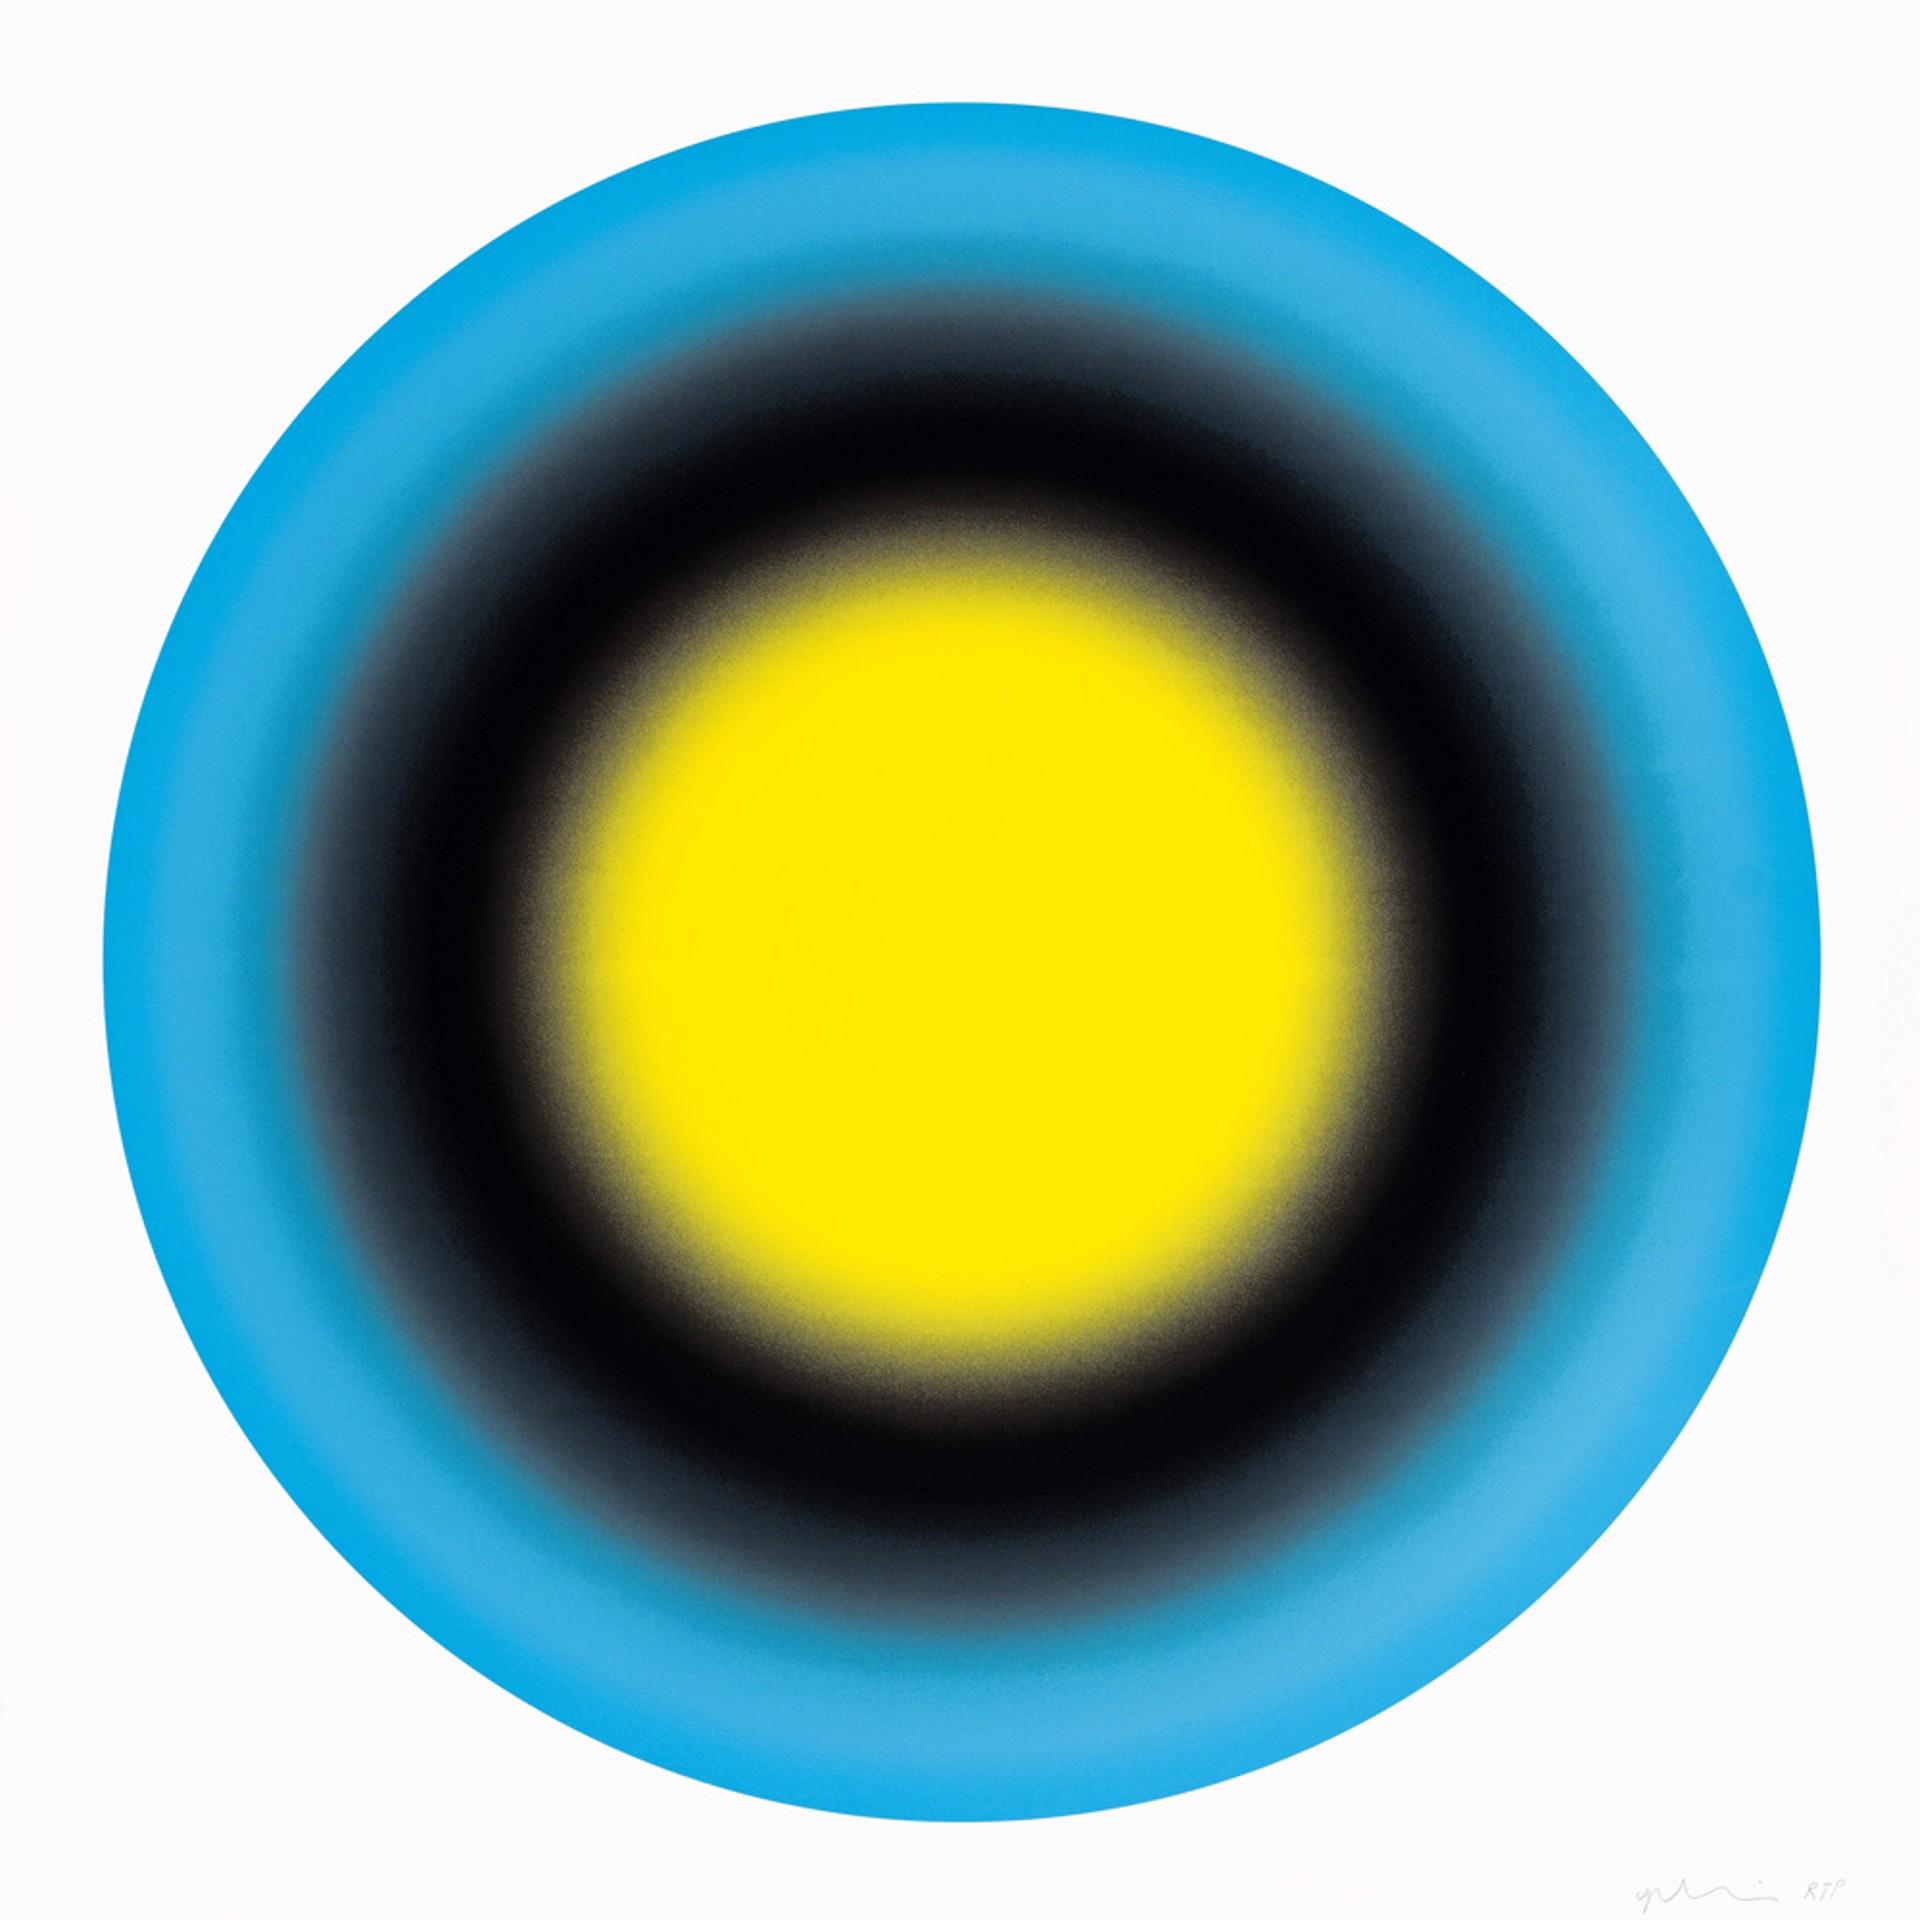 SMALL SUN 1, 2019 by Ugo Rondinone